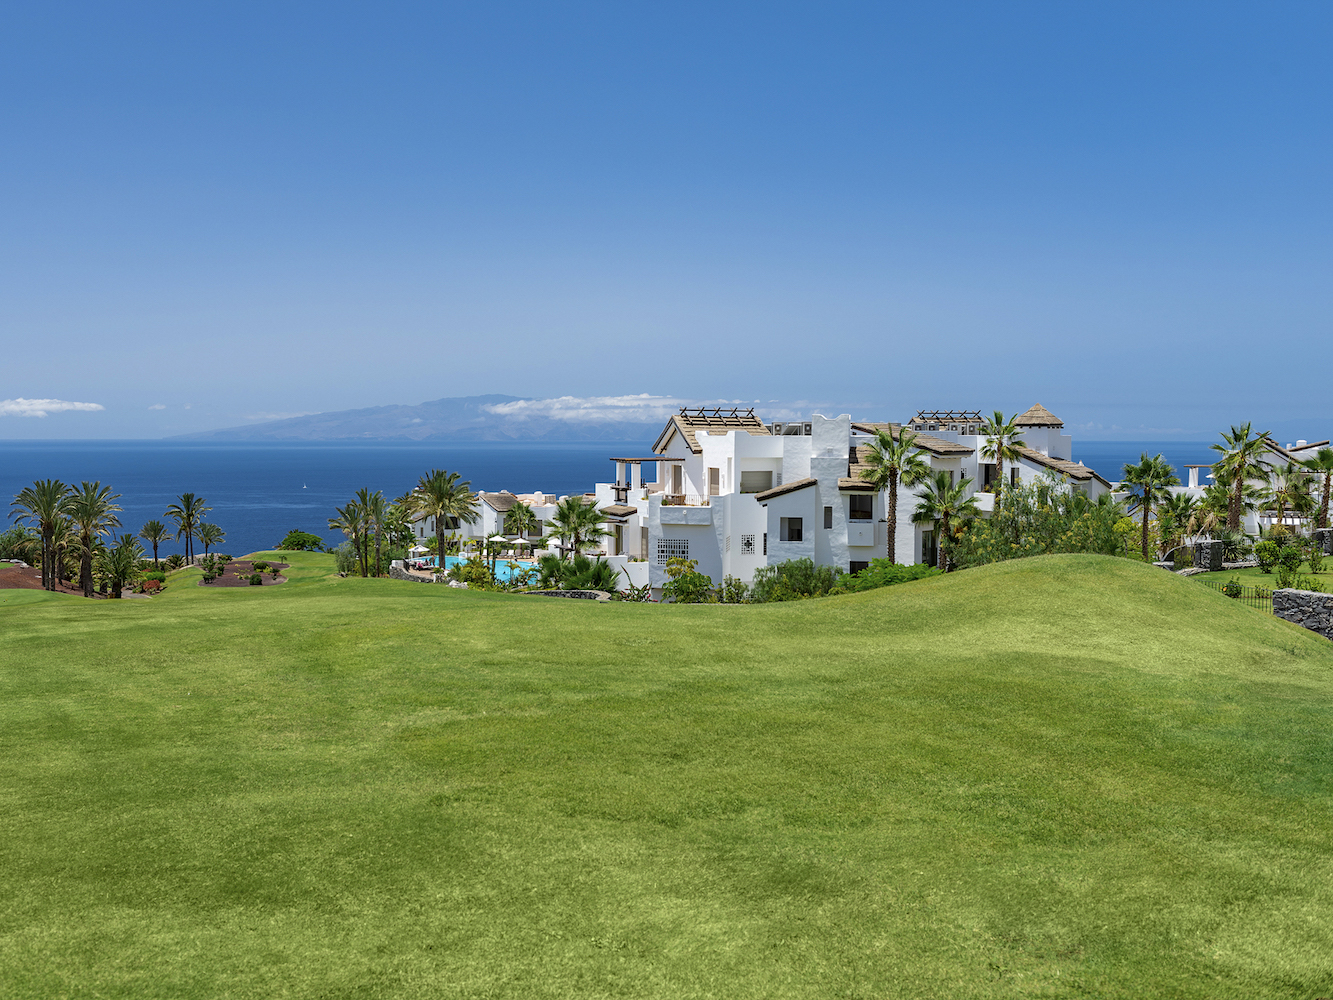 Sea views on Tenerife from Abama Resort